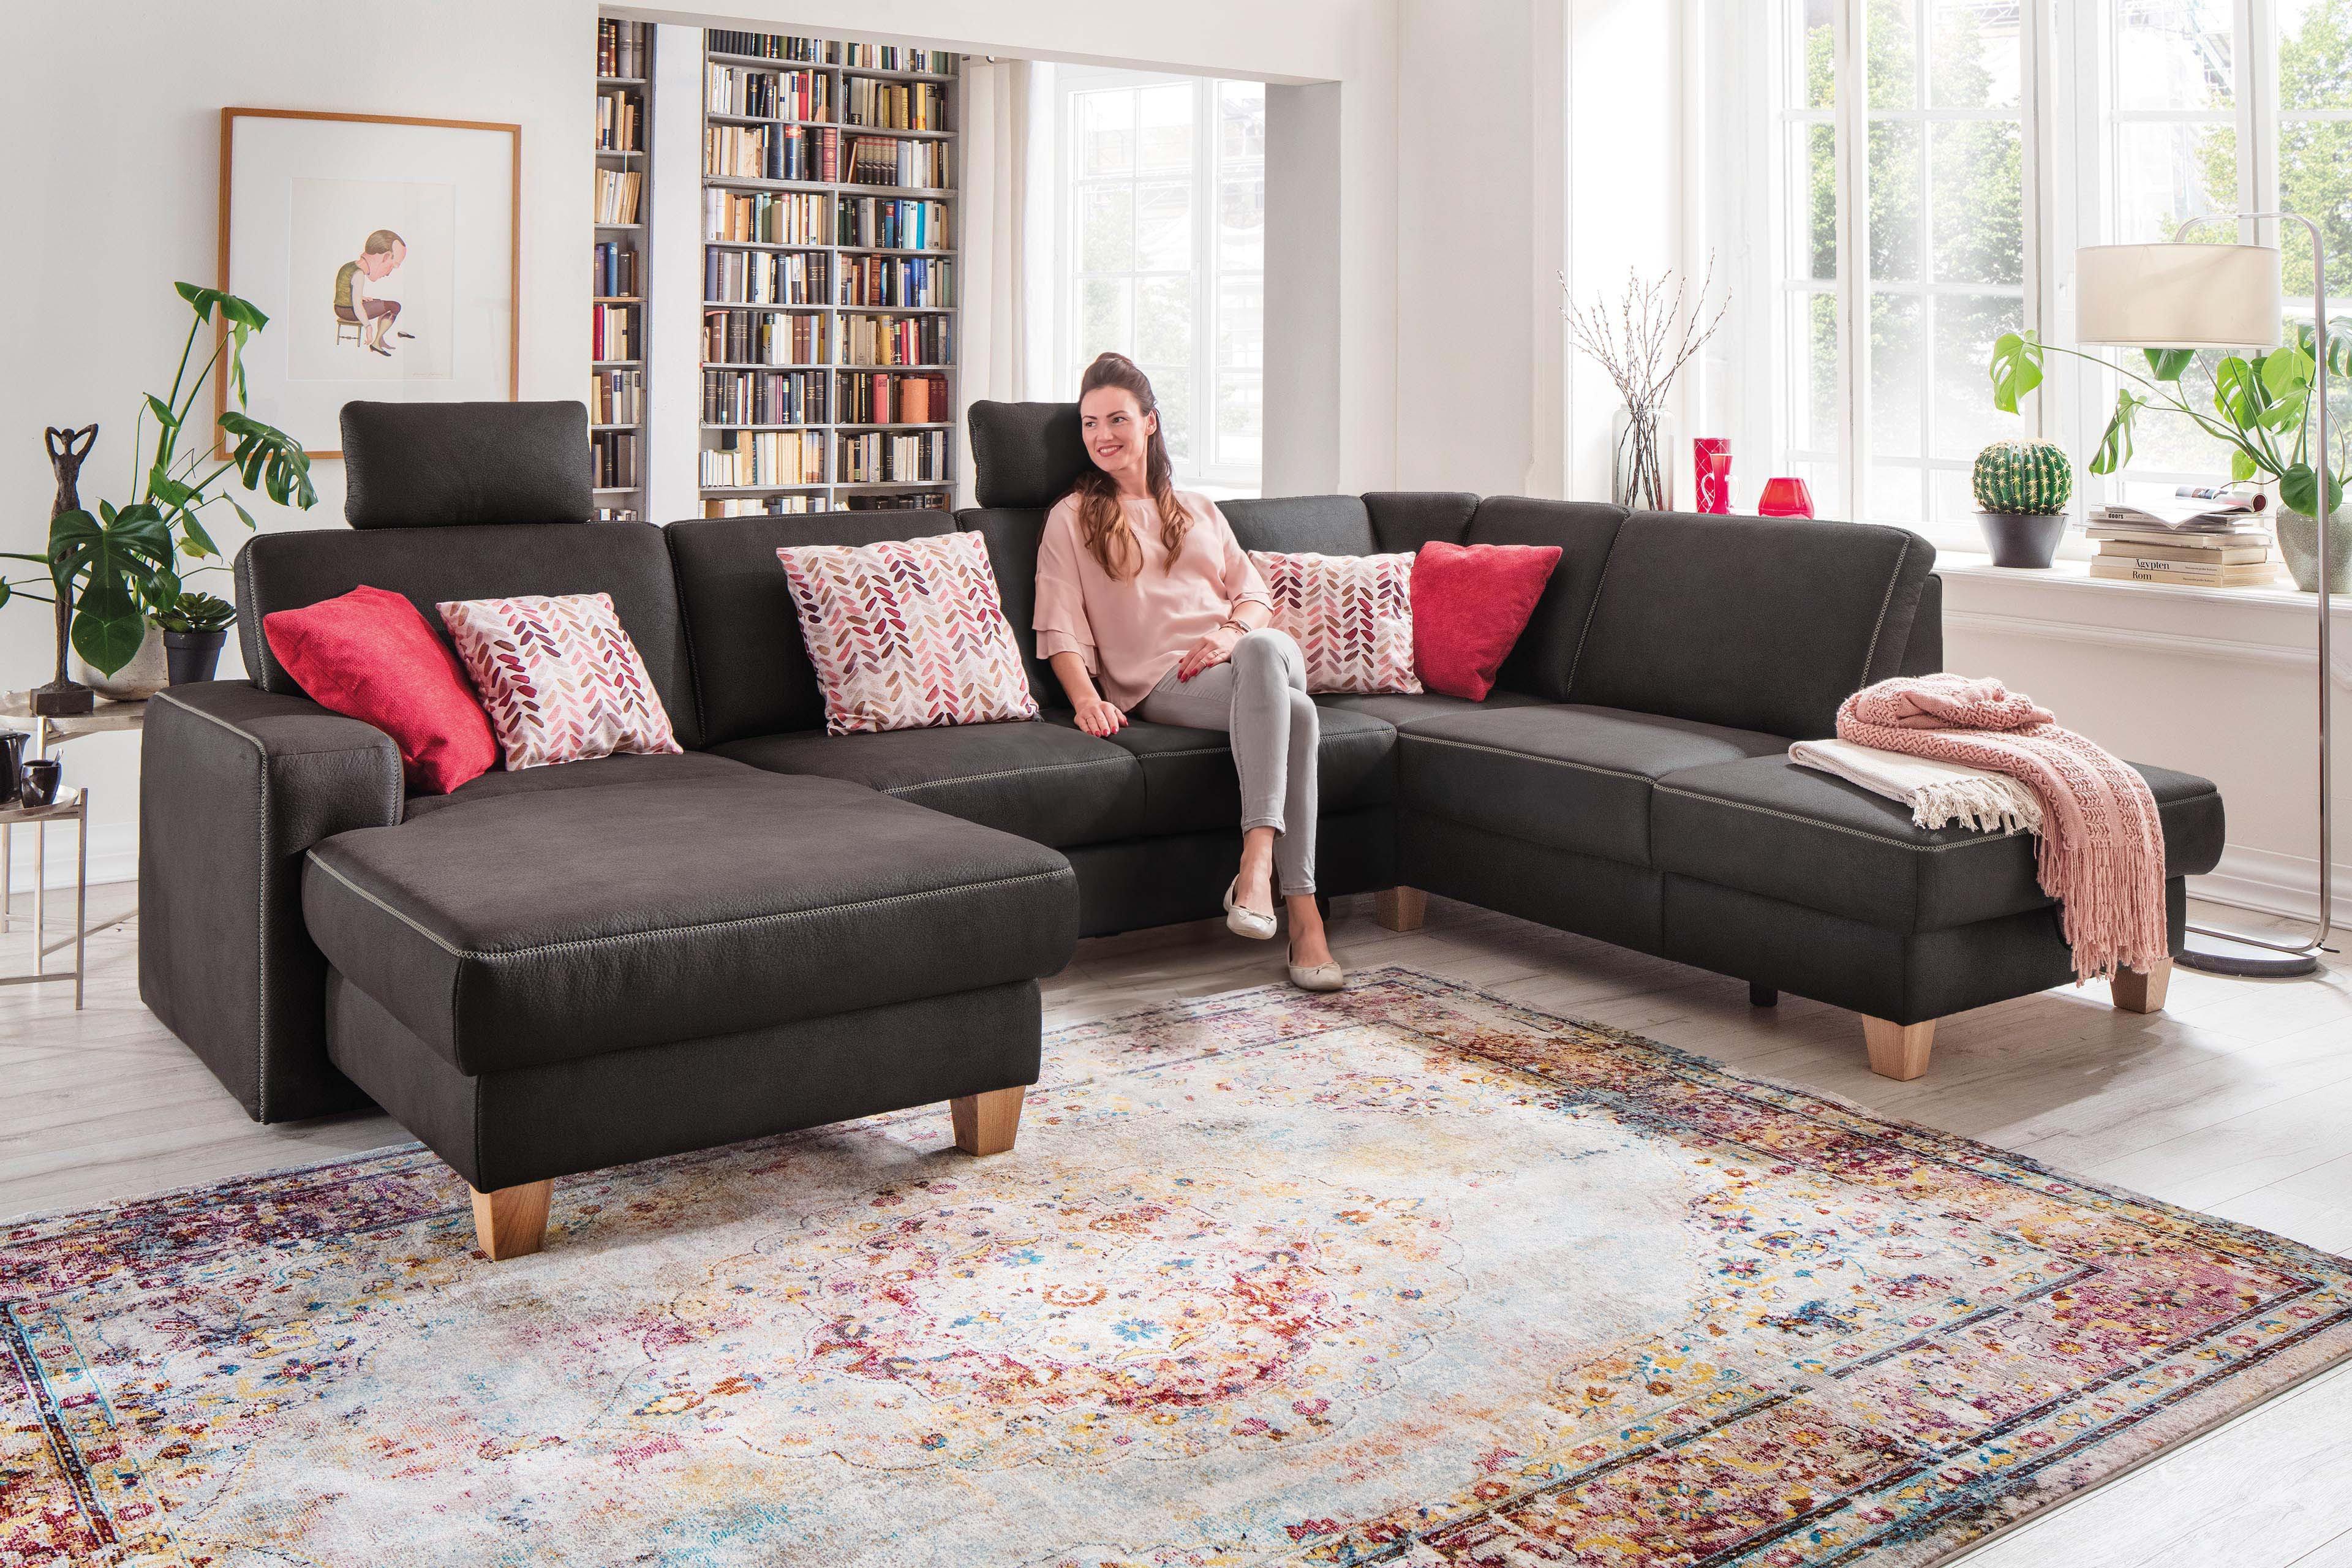 Sit More Home Basic Madison Plus Wohnlandschaft Anthrazit Mobel